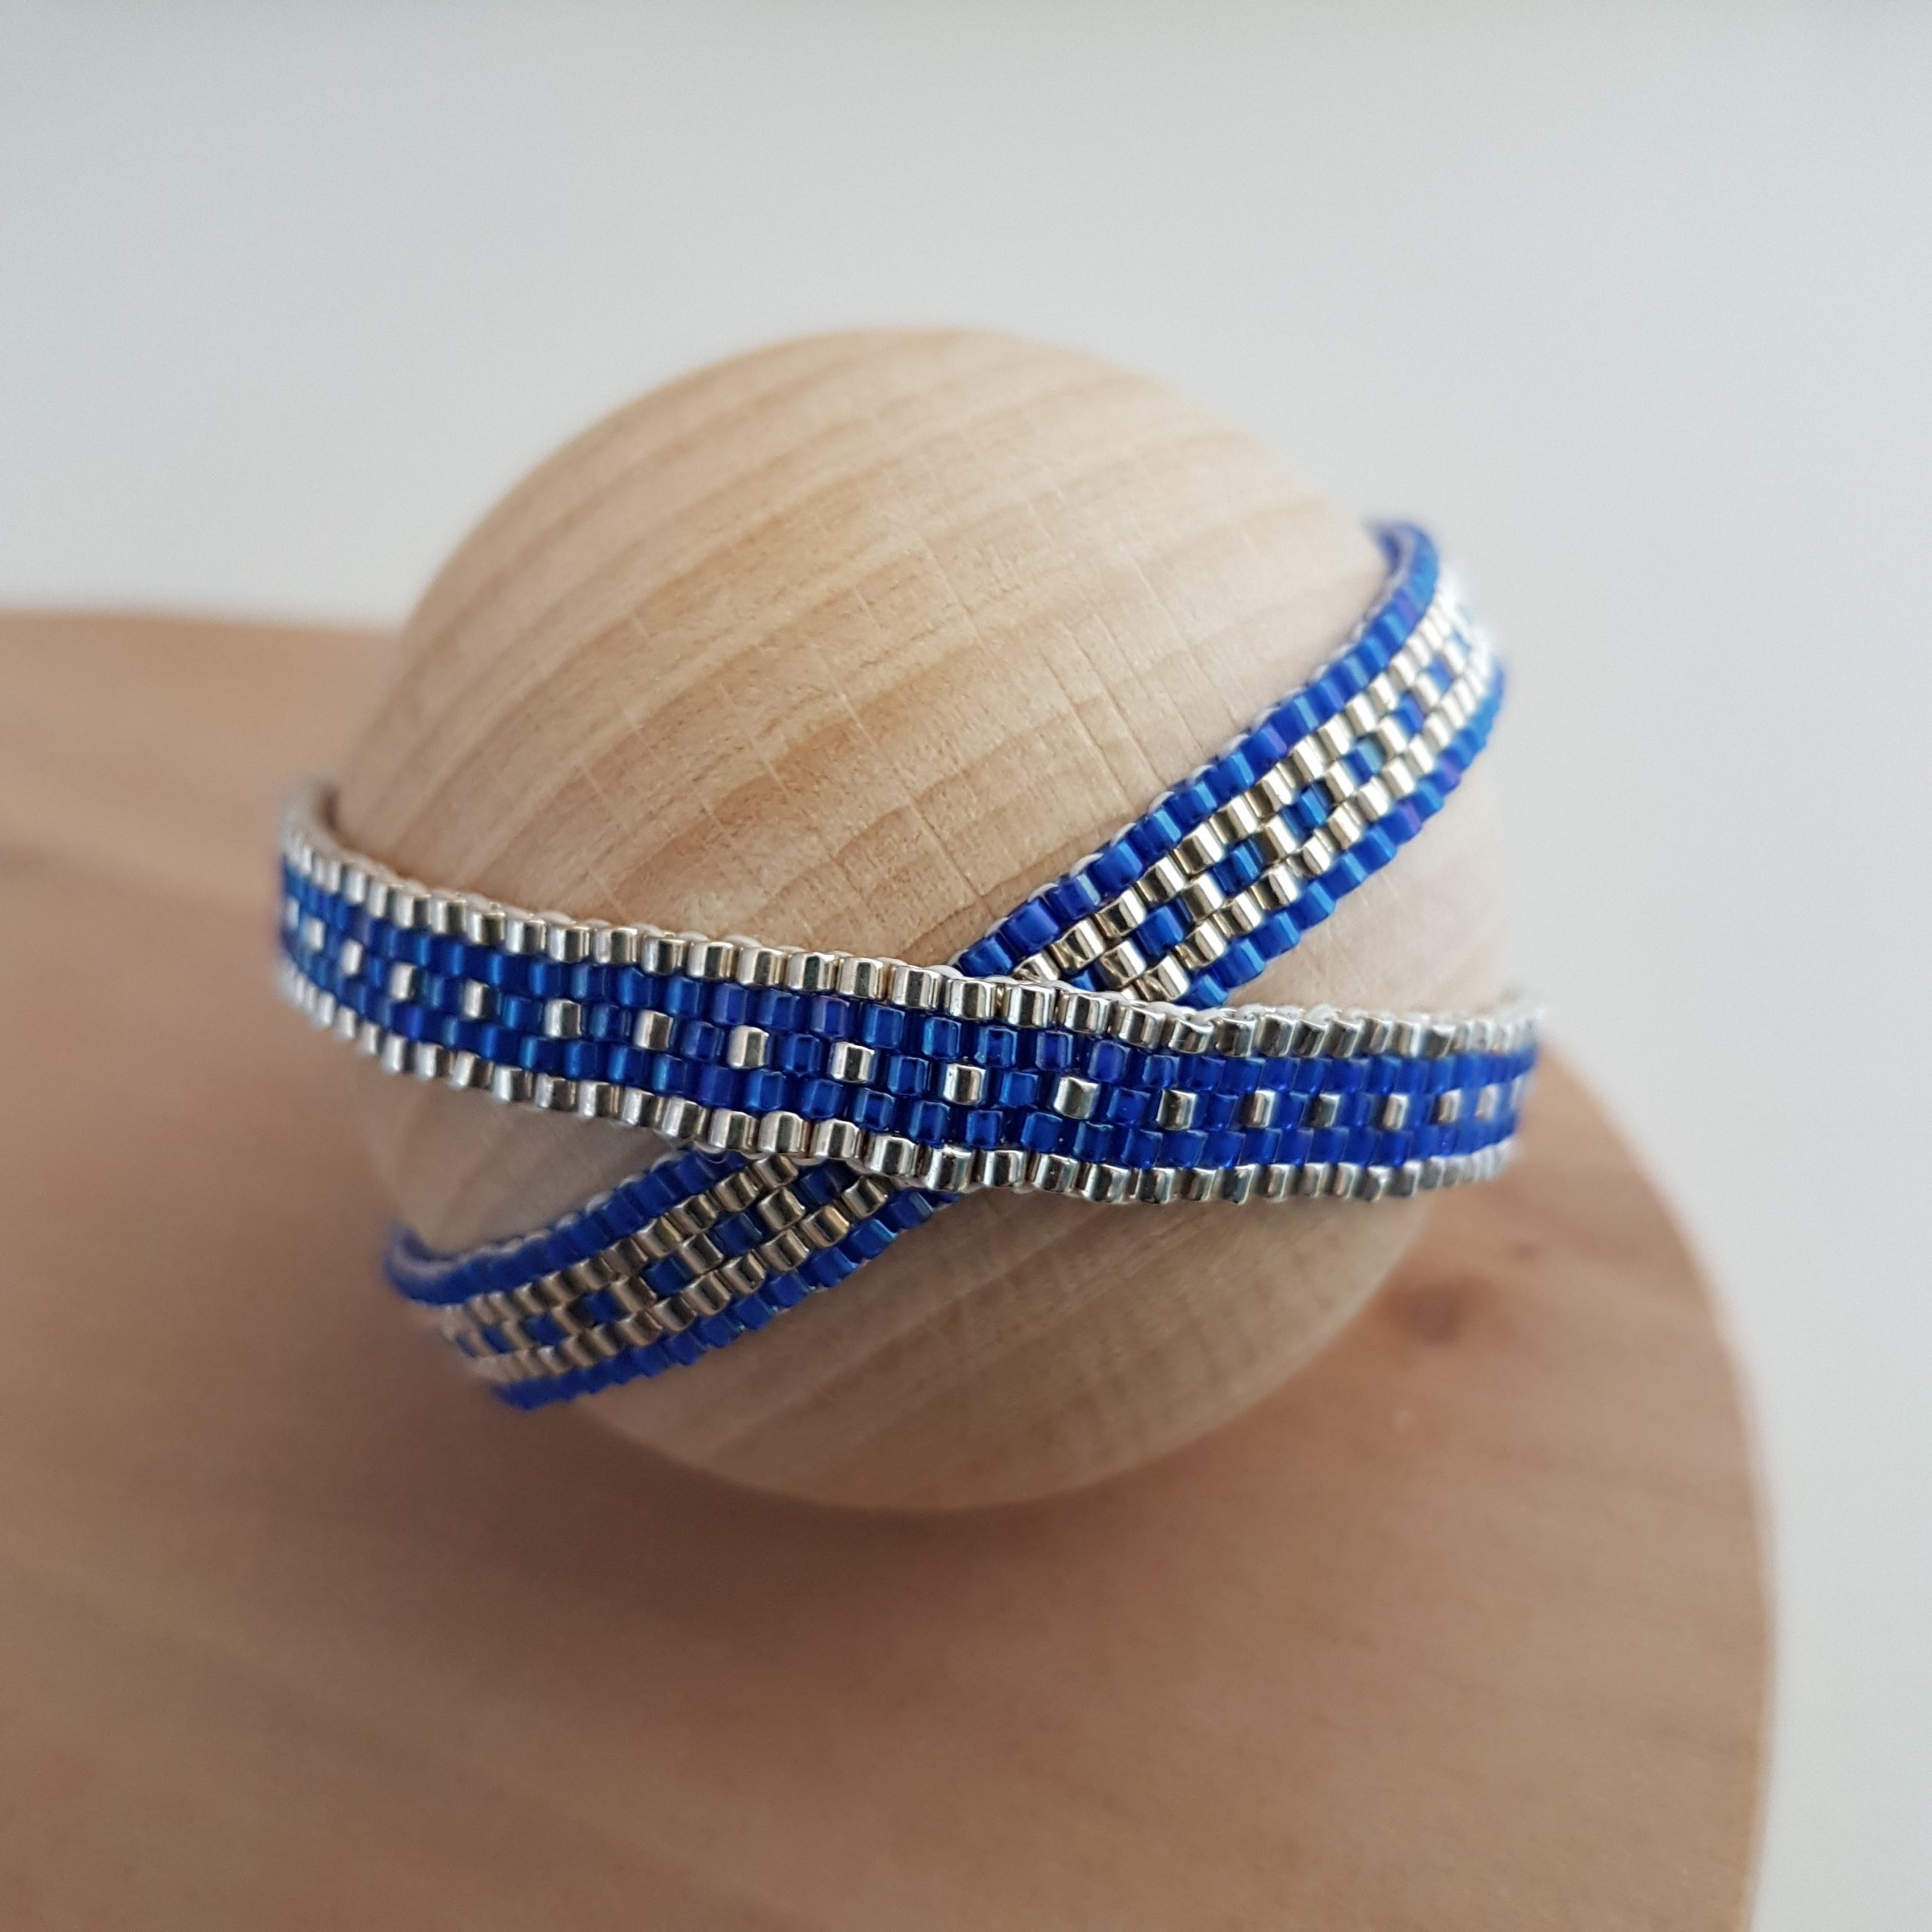 Bracelet Les cumulables bleu roi argent 925 miyuki